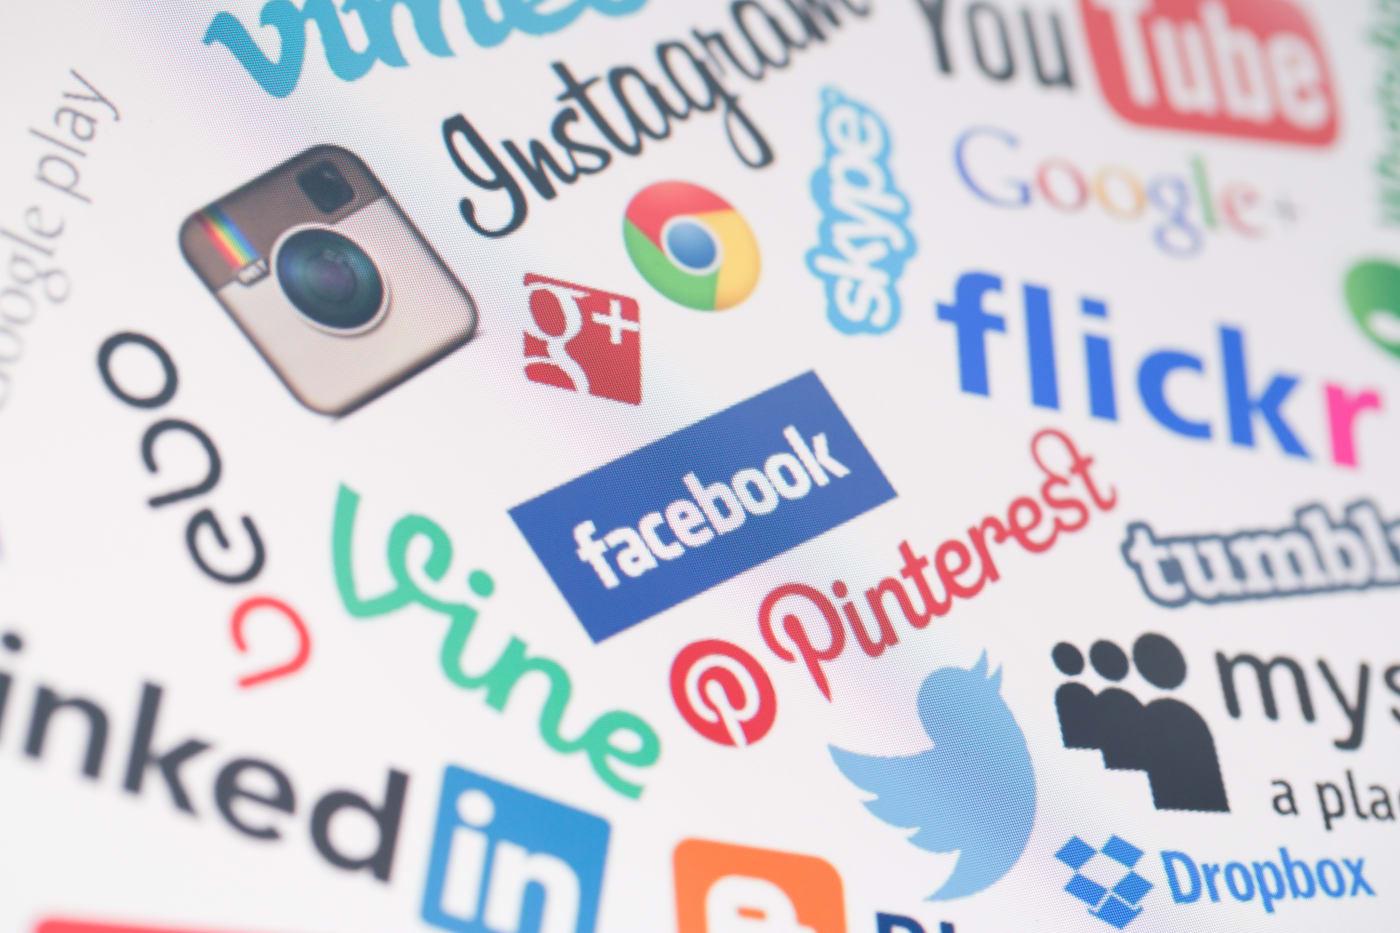 BELCHATOW, POLAND - DECEMBER 28, 2014: Popular social media website logos on computer screen